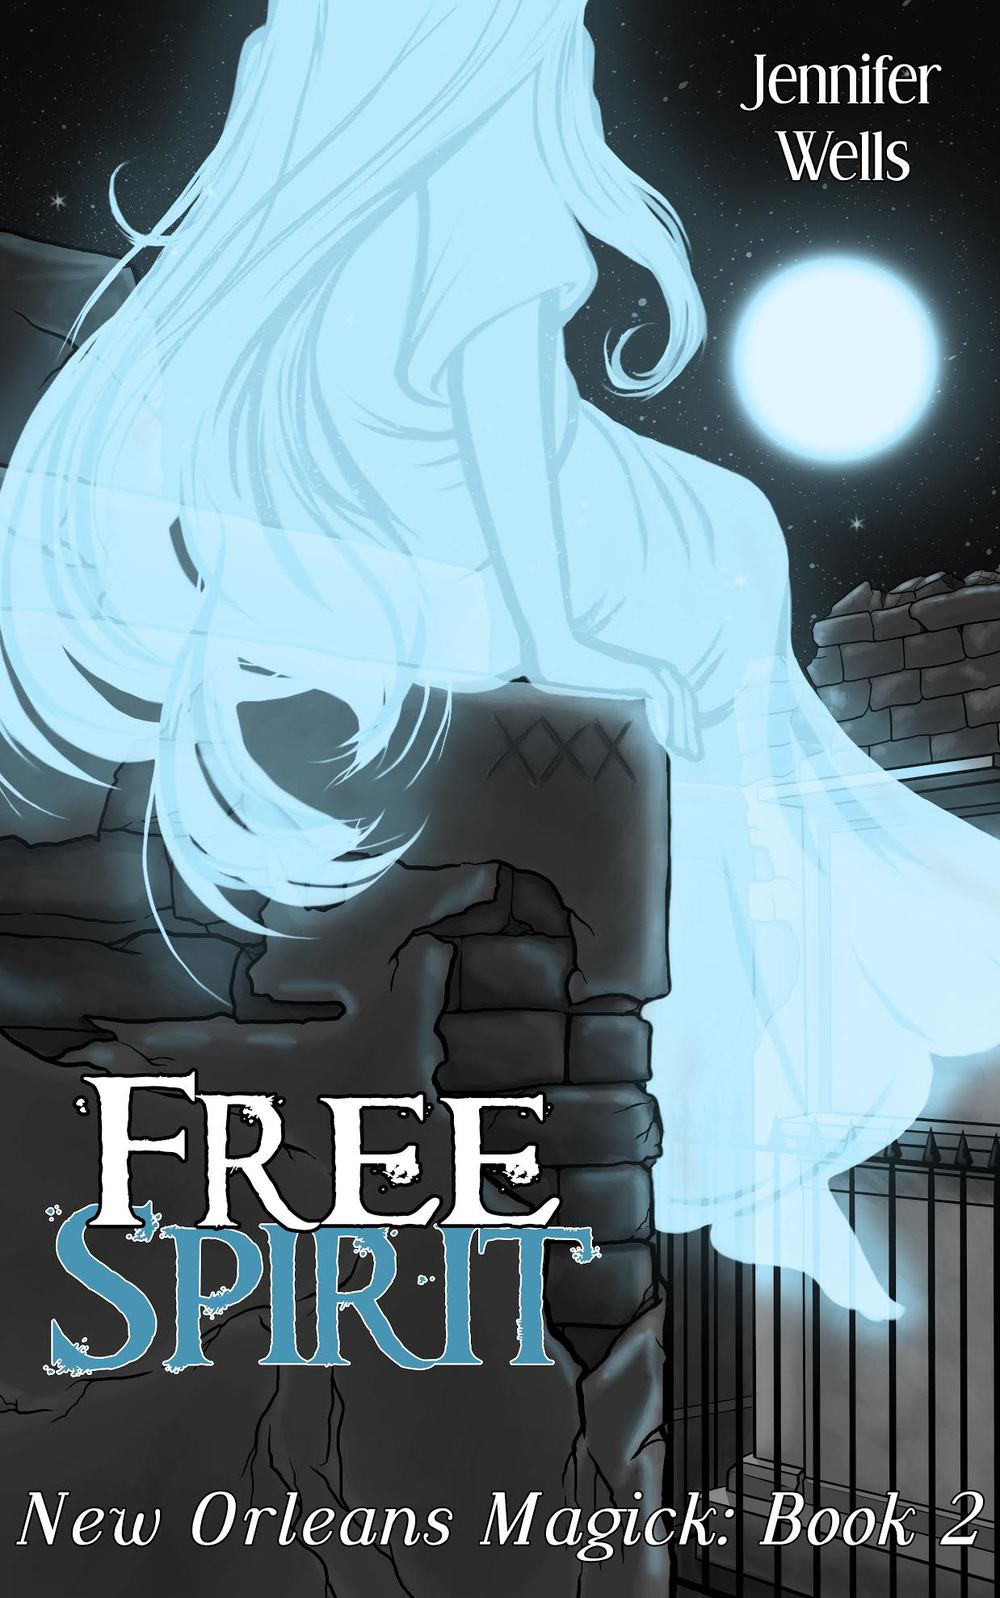 Free Spirit by Jennifer Wells